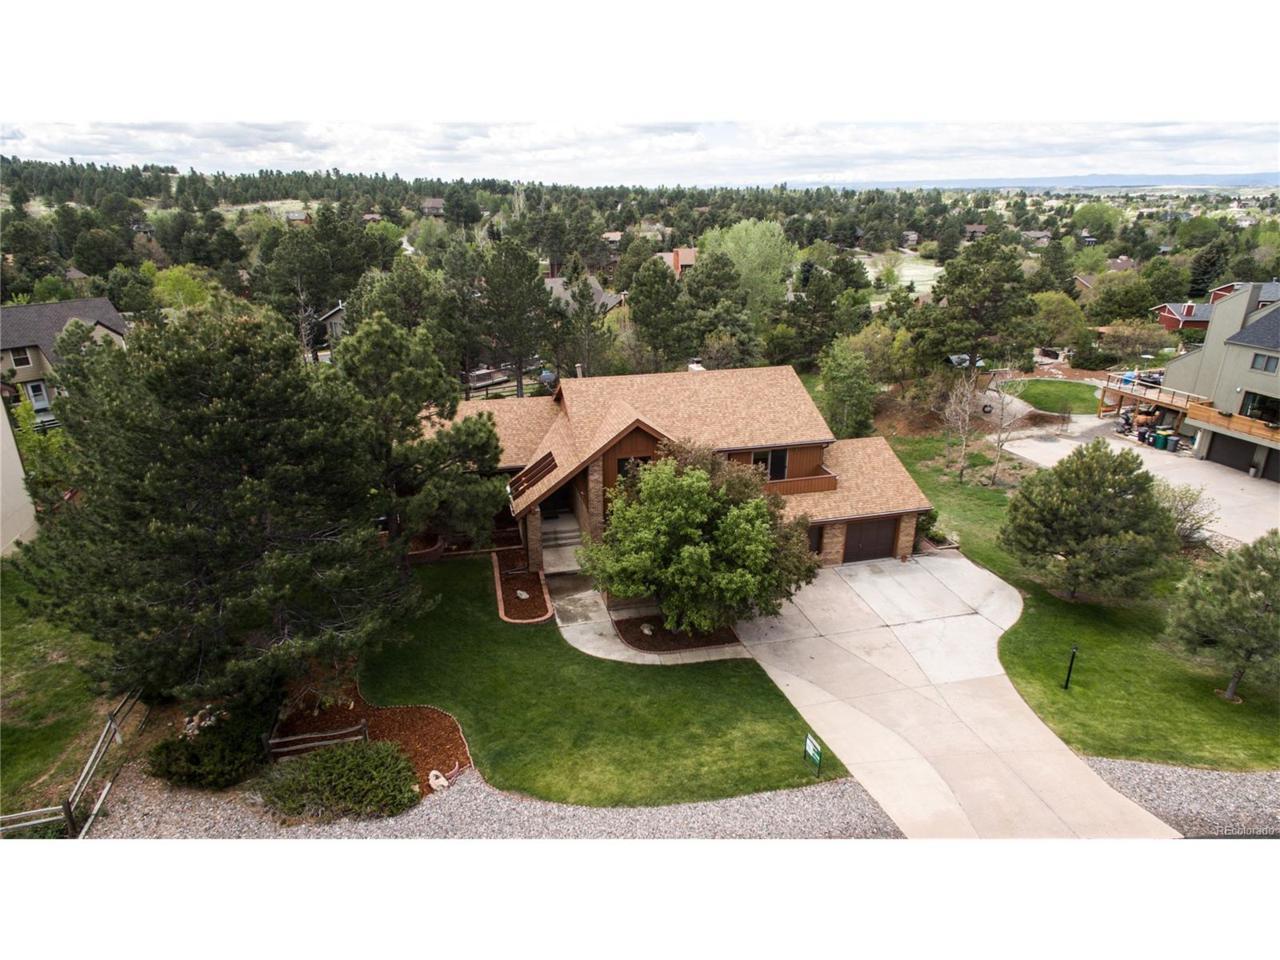 8218 Lakeshore Drive, Parker, CO 80134 (MLS #5012795) :: 8z Real Estate